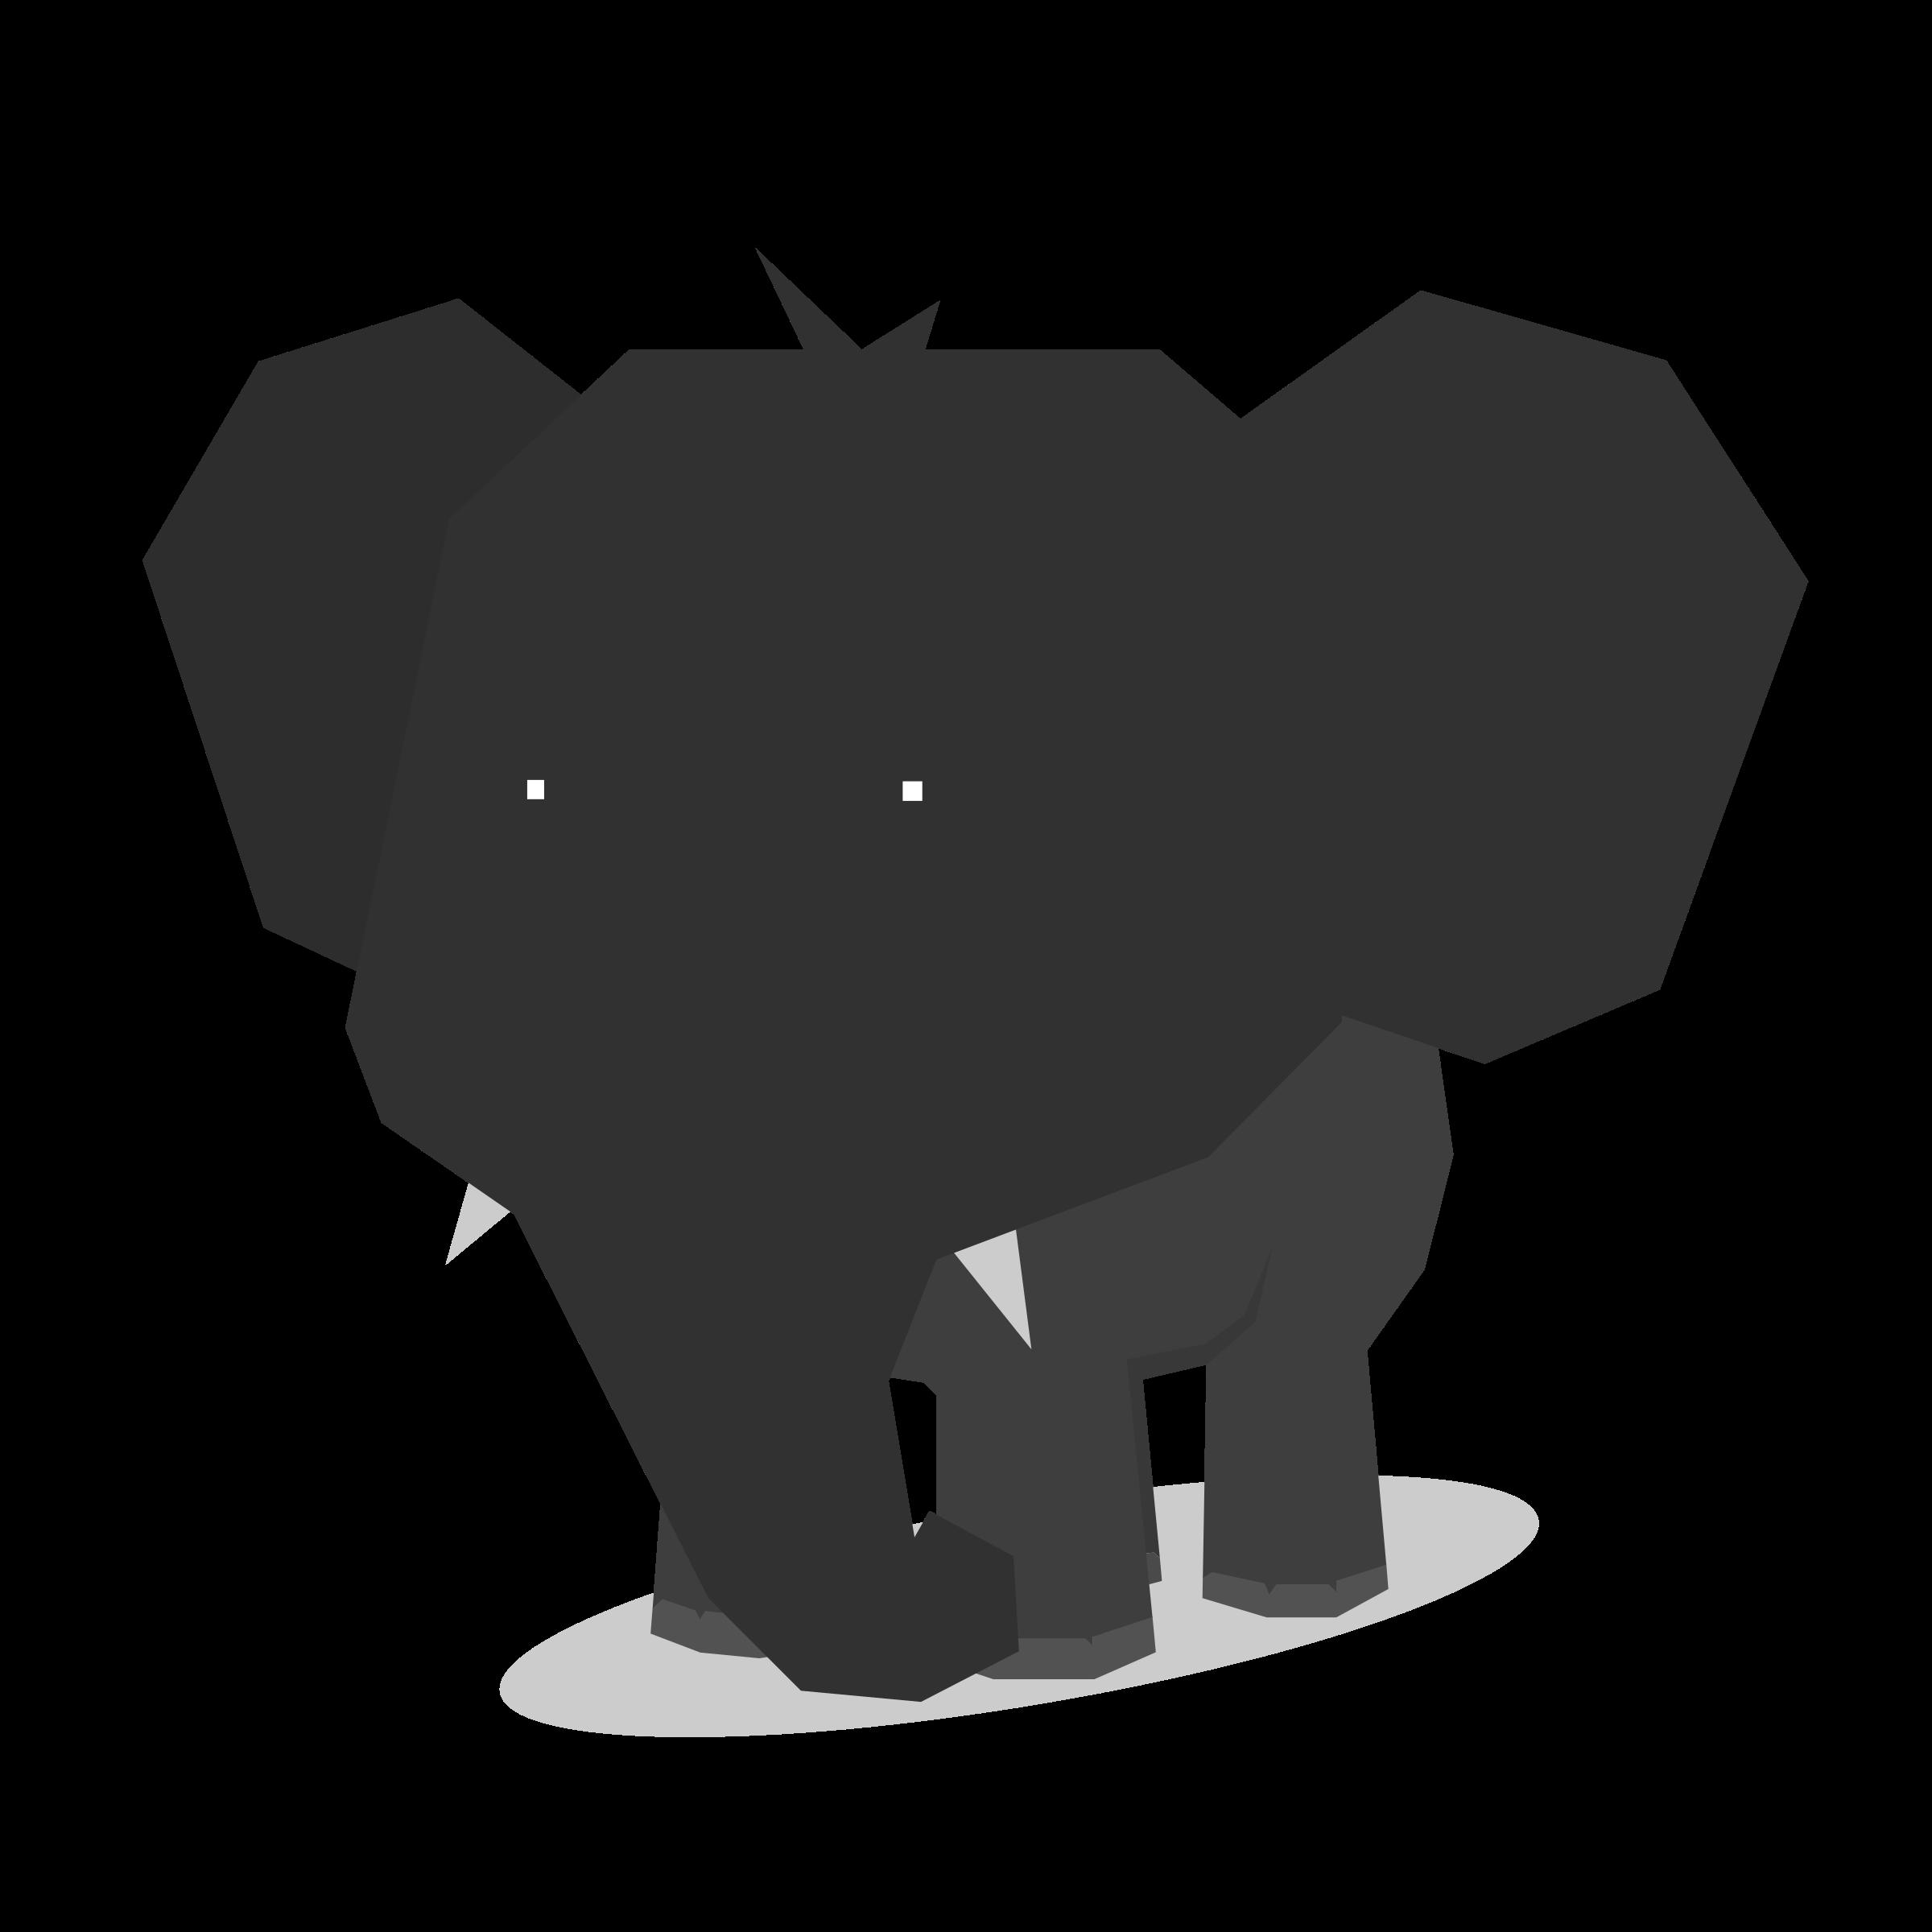 Tree clipart elephant. Minimal flat design animal